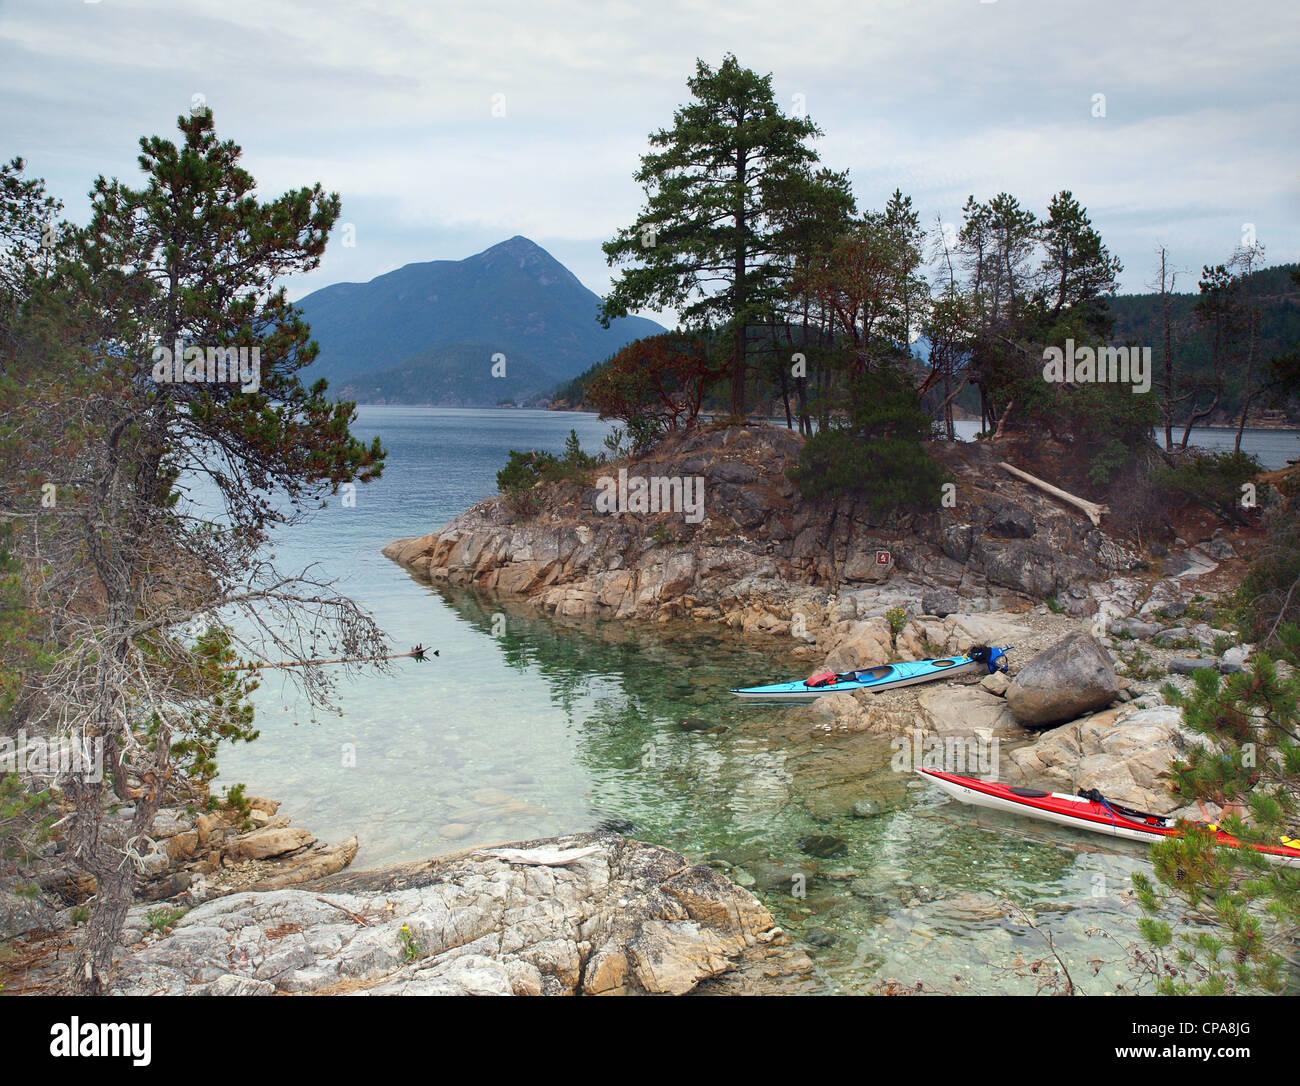 sea kayaks, The Curme Islands in Desolation Sound, British Columbia - Stock Image